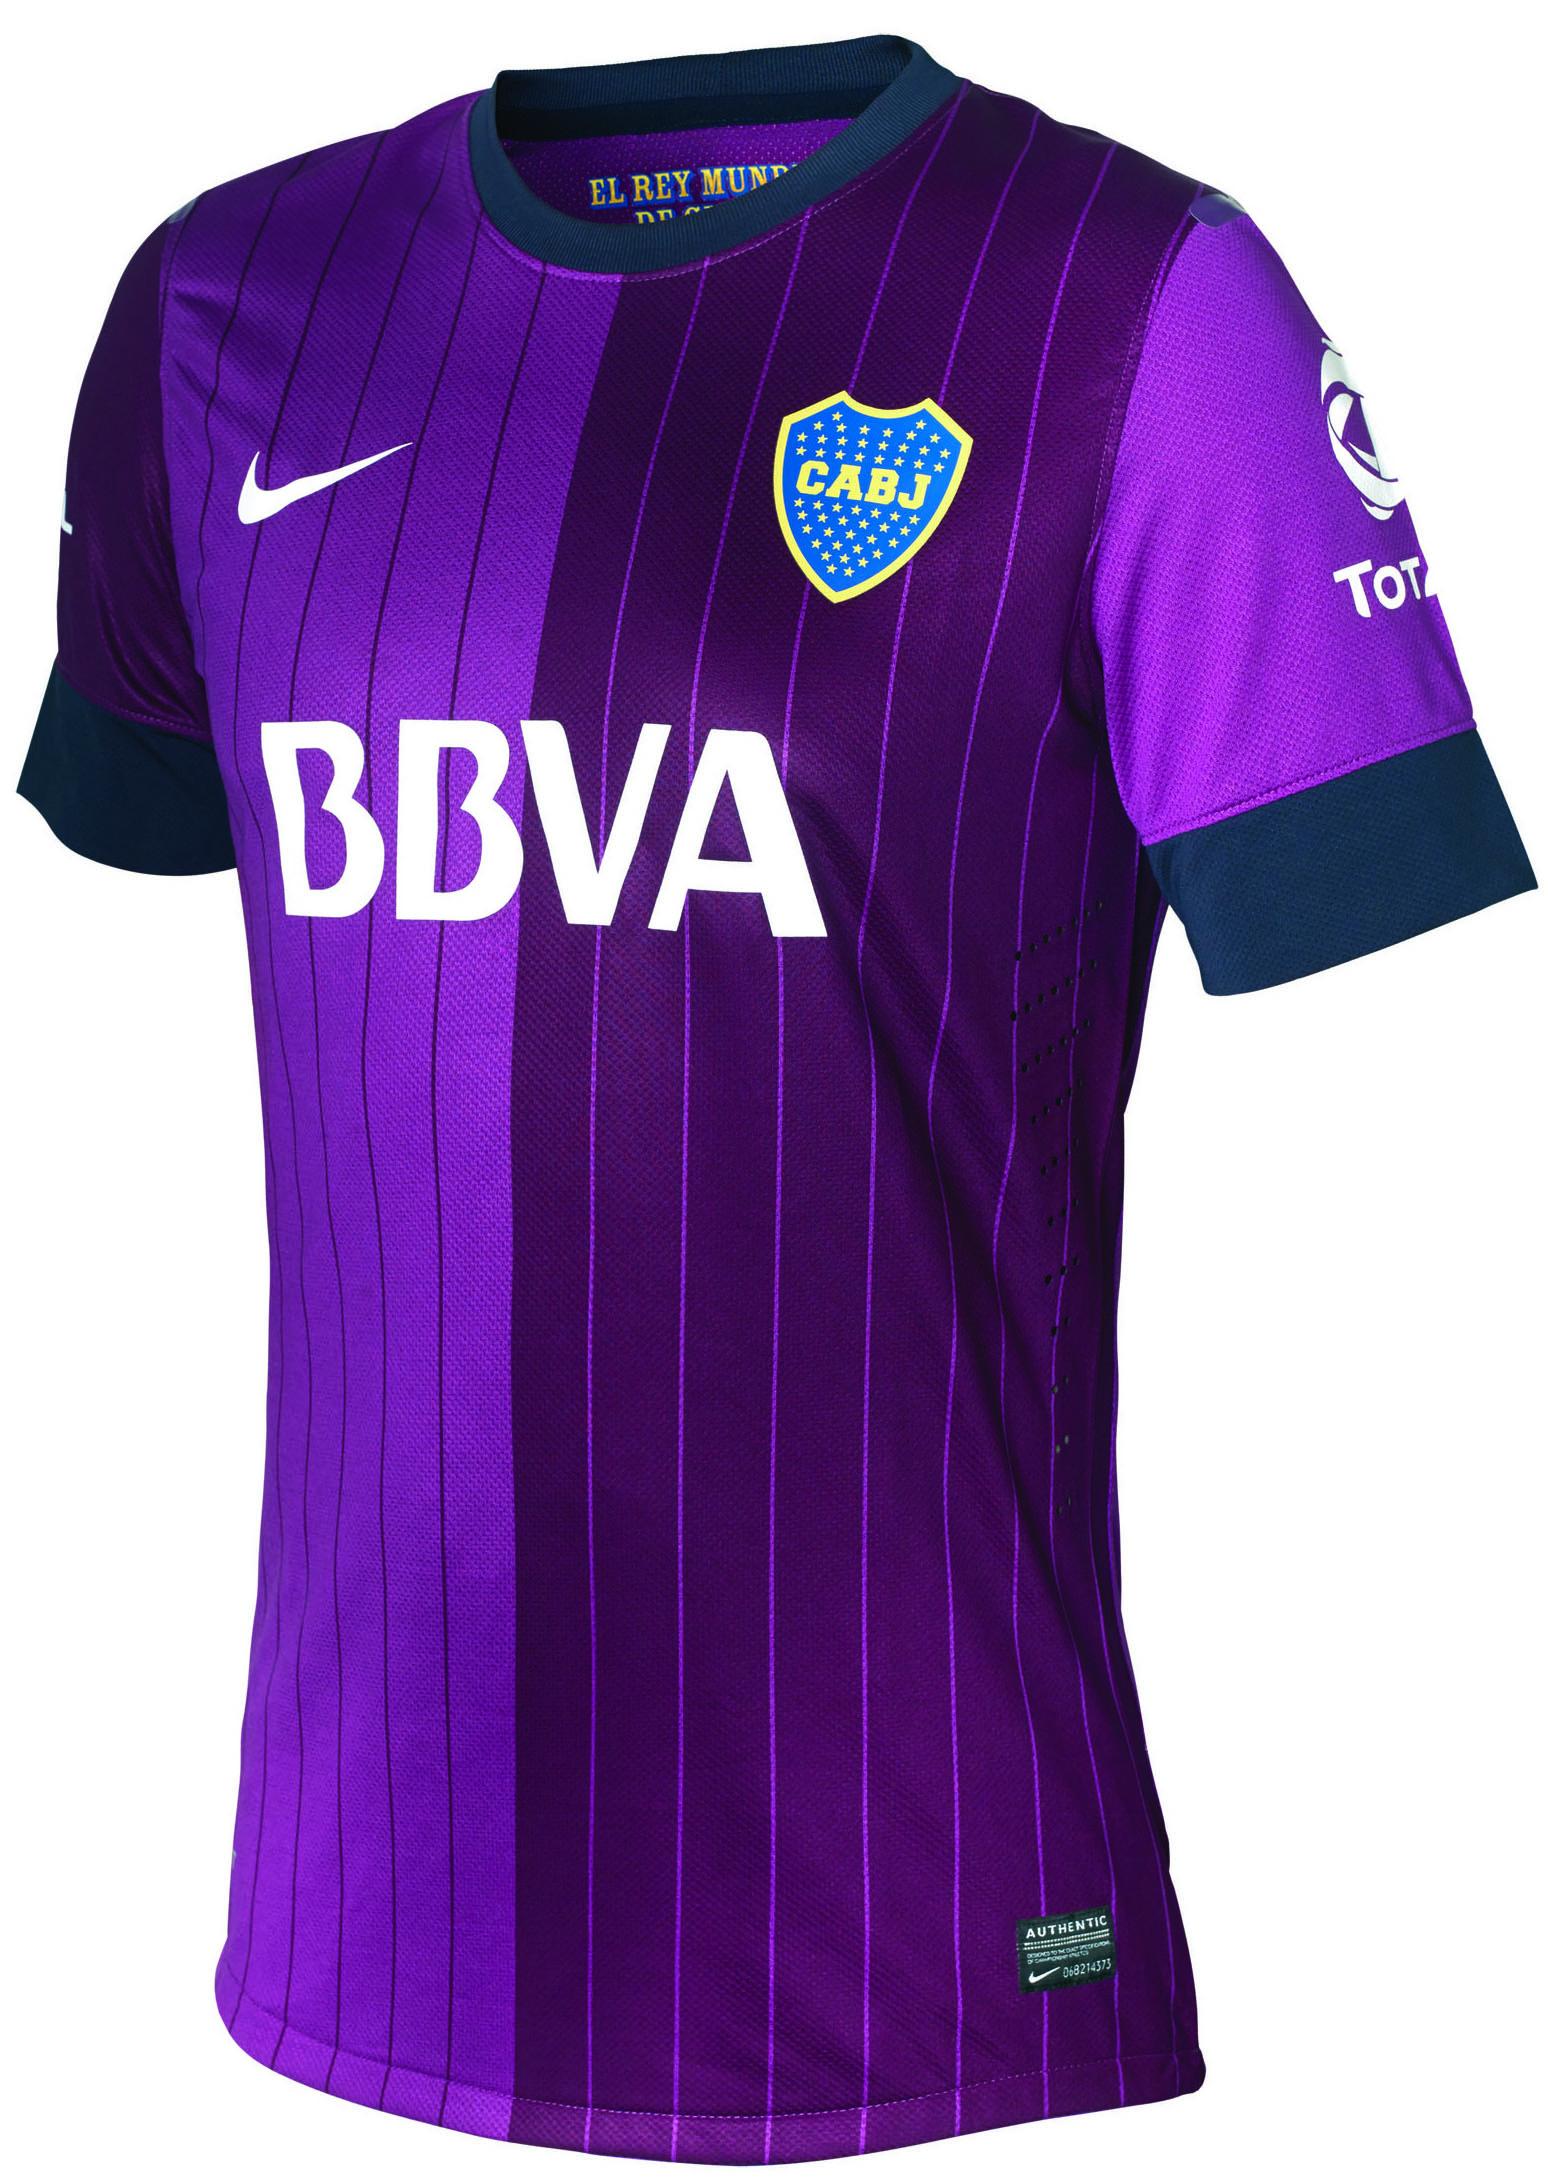 Boca_Juniors_Purple_Jersey_16759.jpg